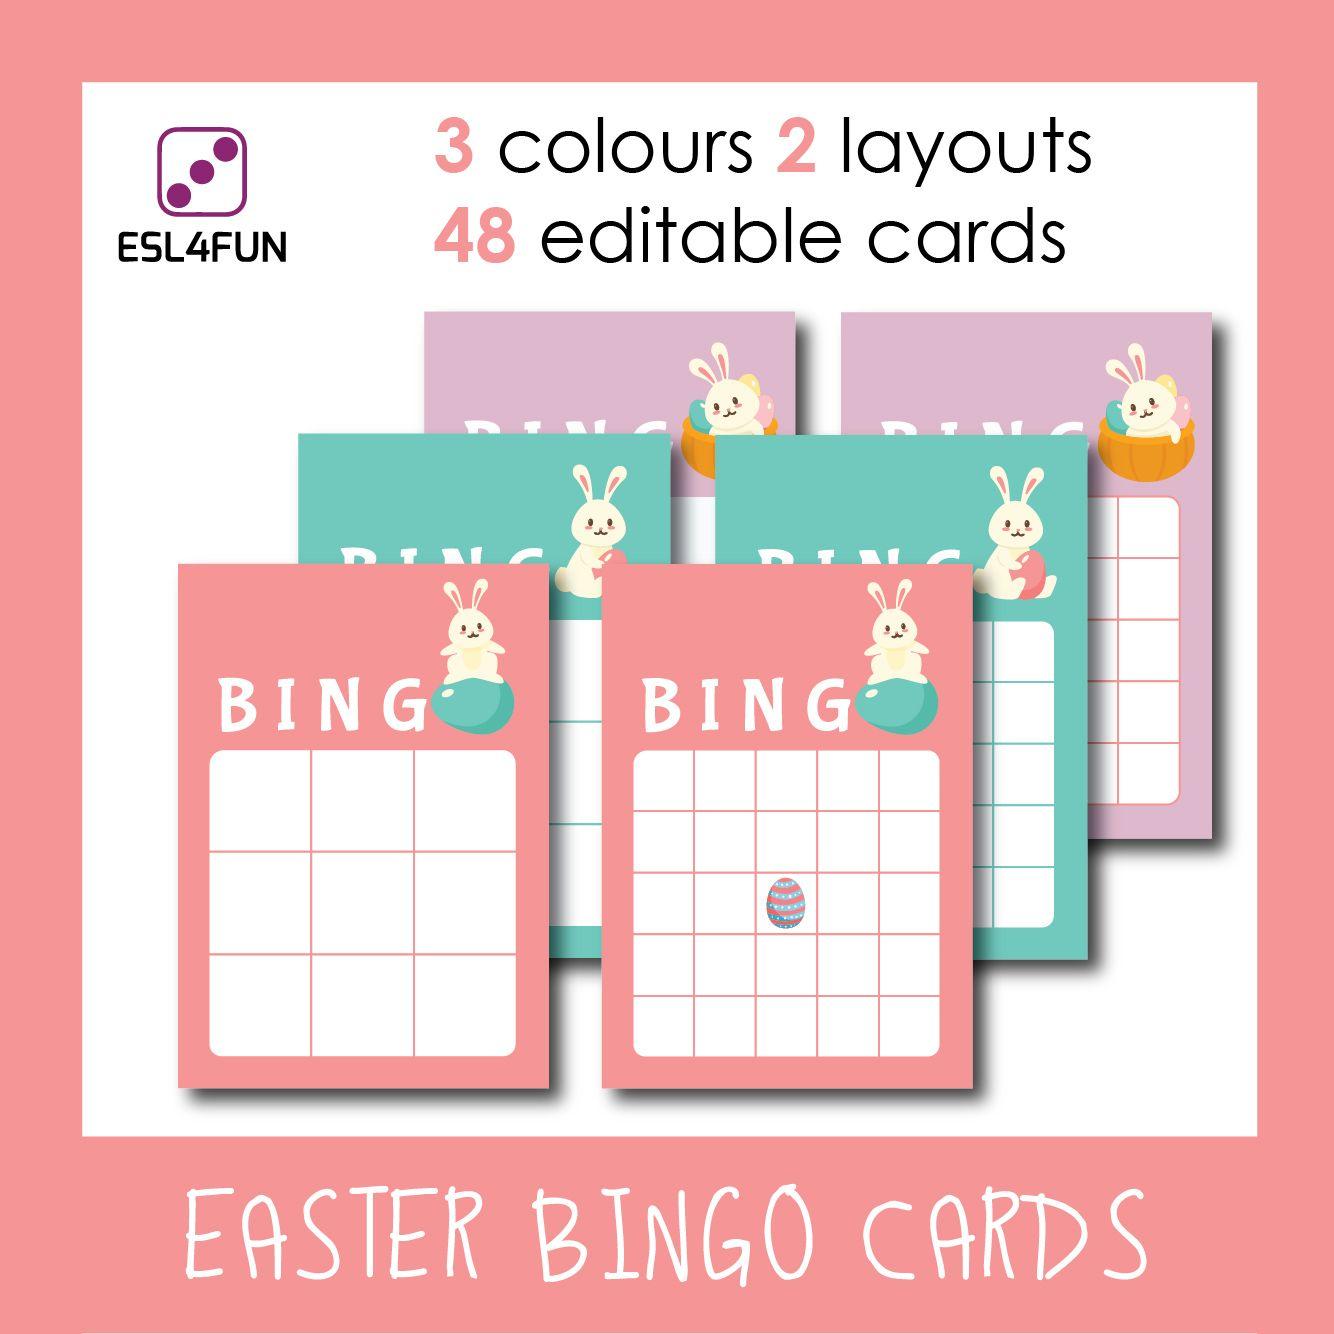 Editable Easter Bingo Cards